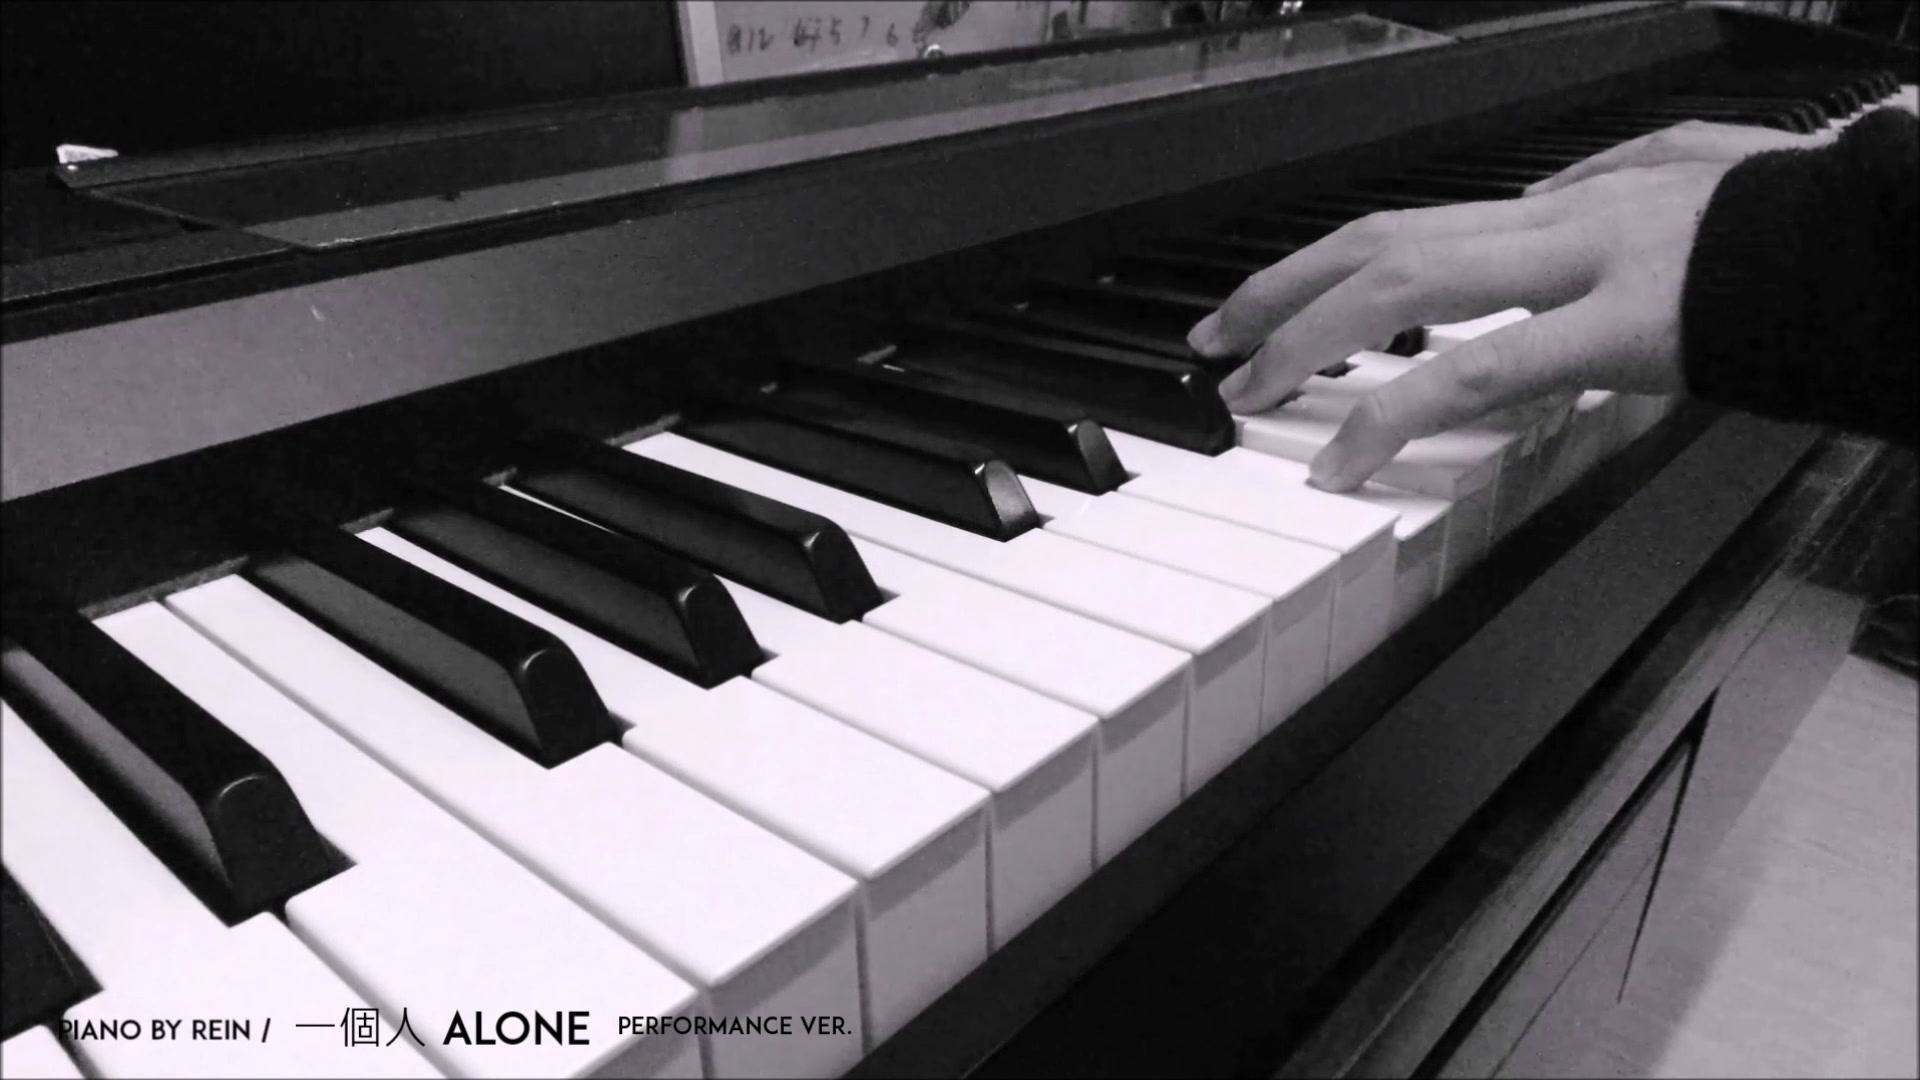 alone 一个人 - lay张艺兴- 钢琴版图片